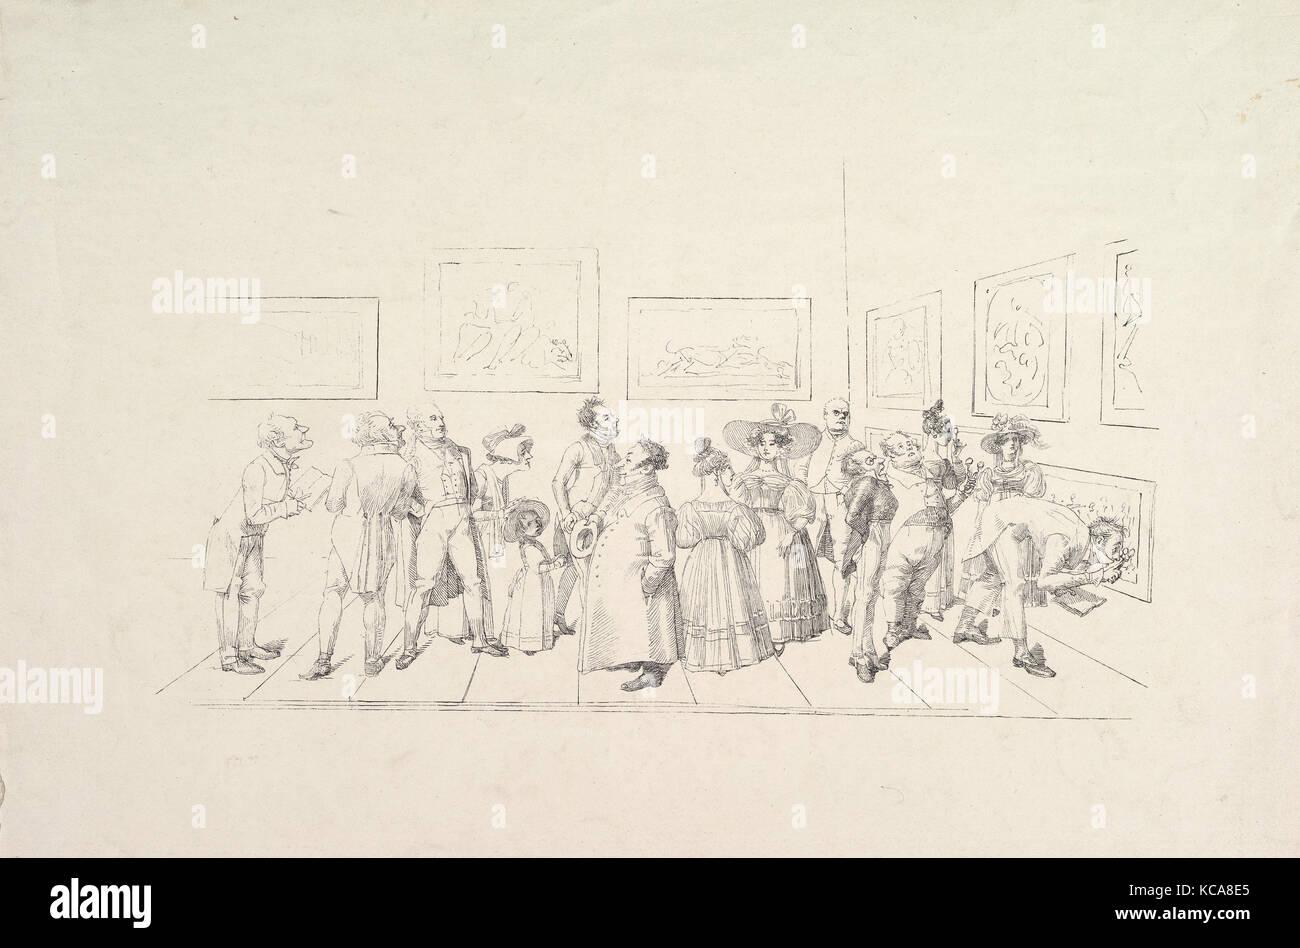 The Public at an Exhibition, Johann Gottfried Schadow, 1831 Stock Photo